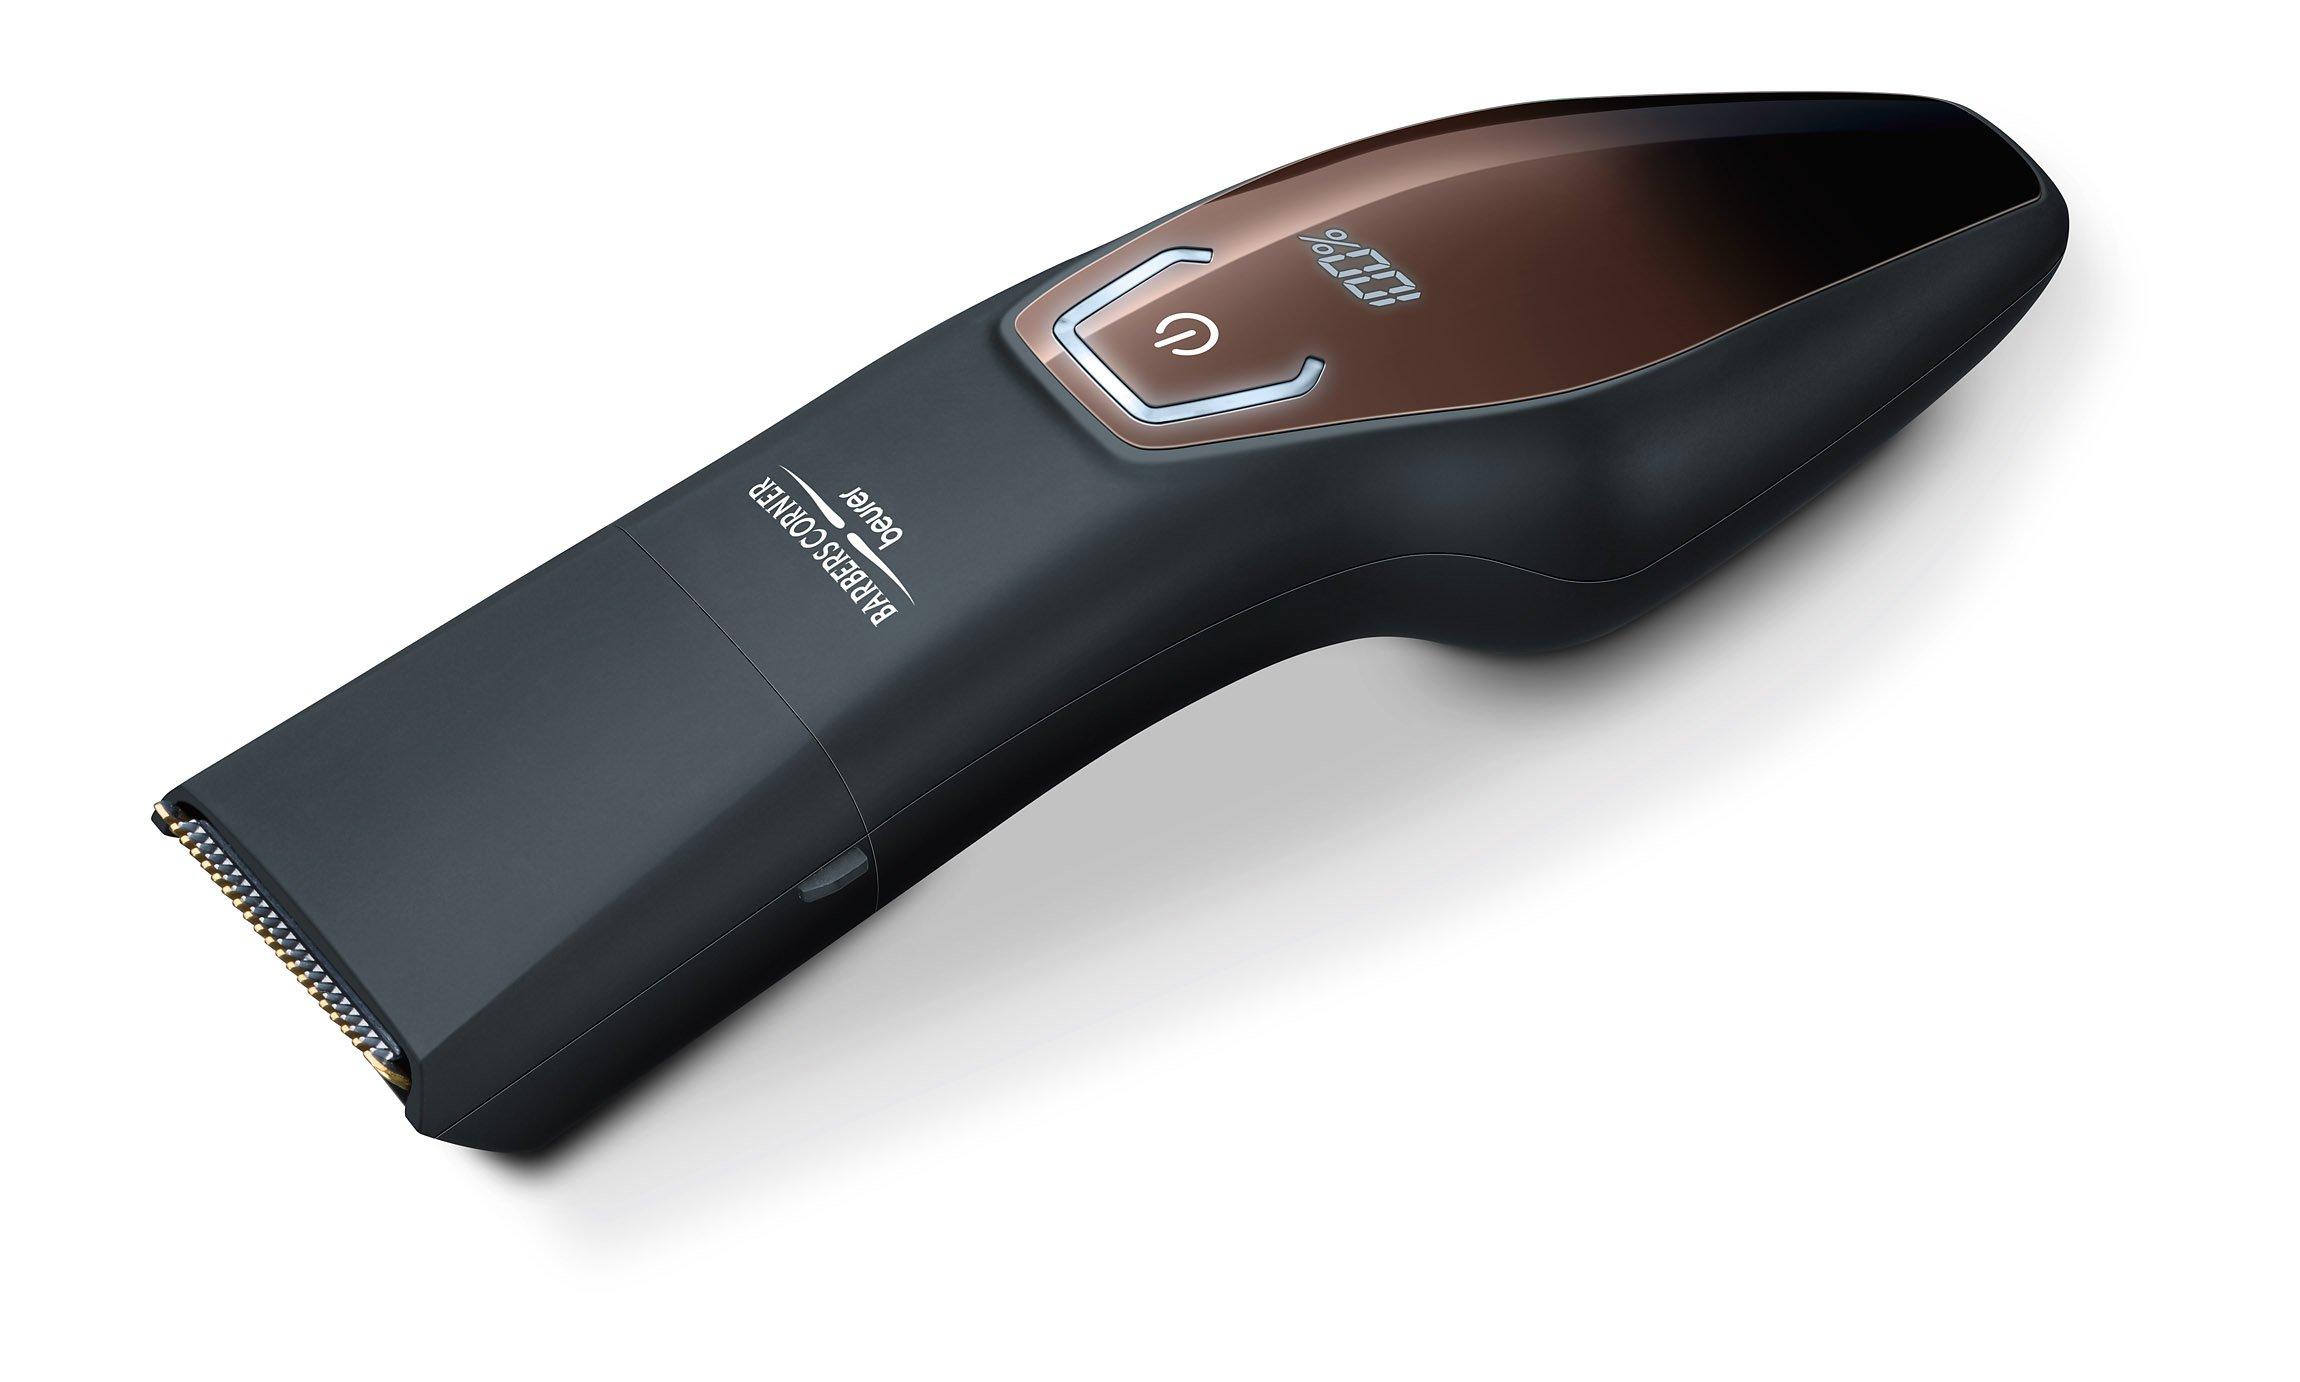 Beurer - HR 4000 Beard trimmer / Styler - 3 Years Warranty